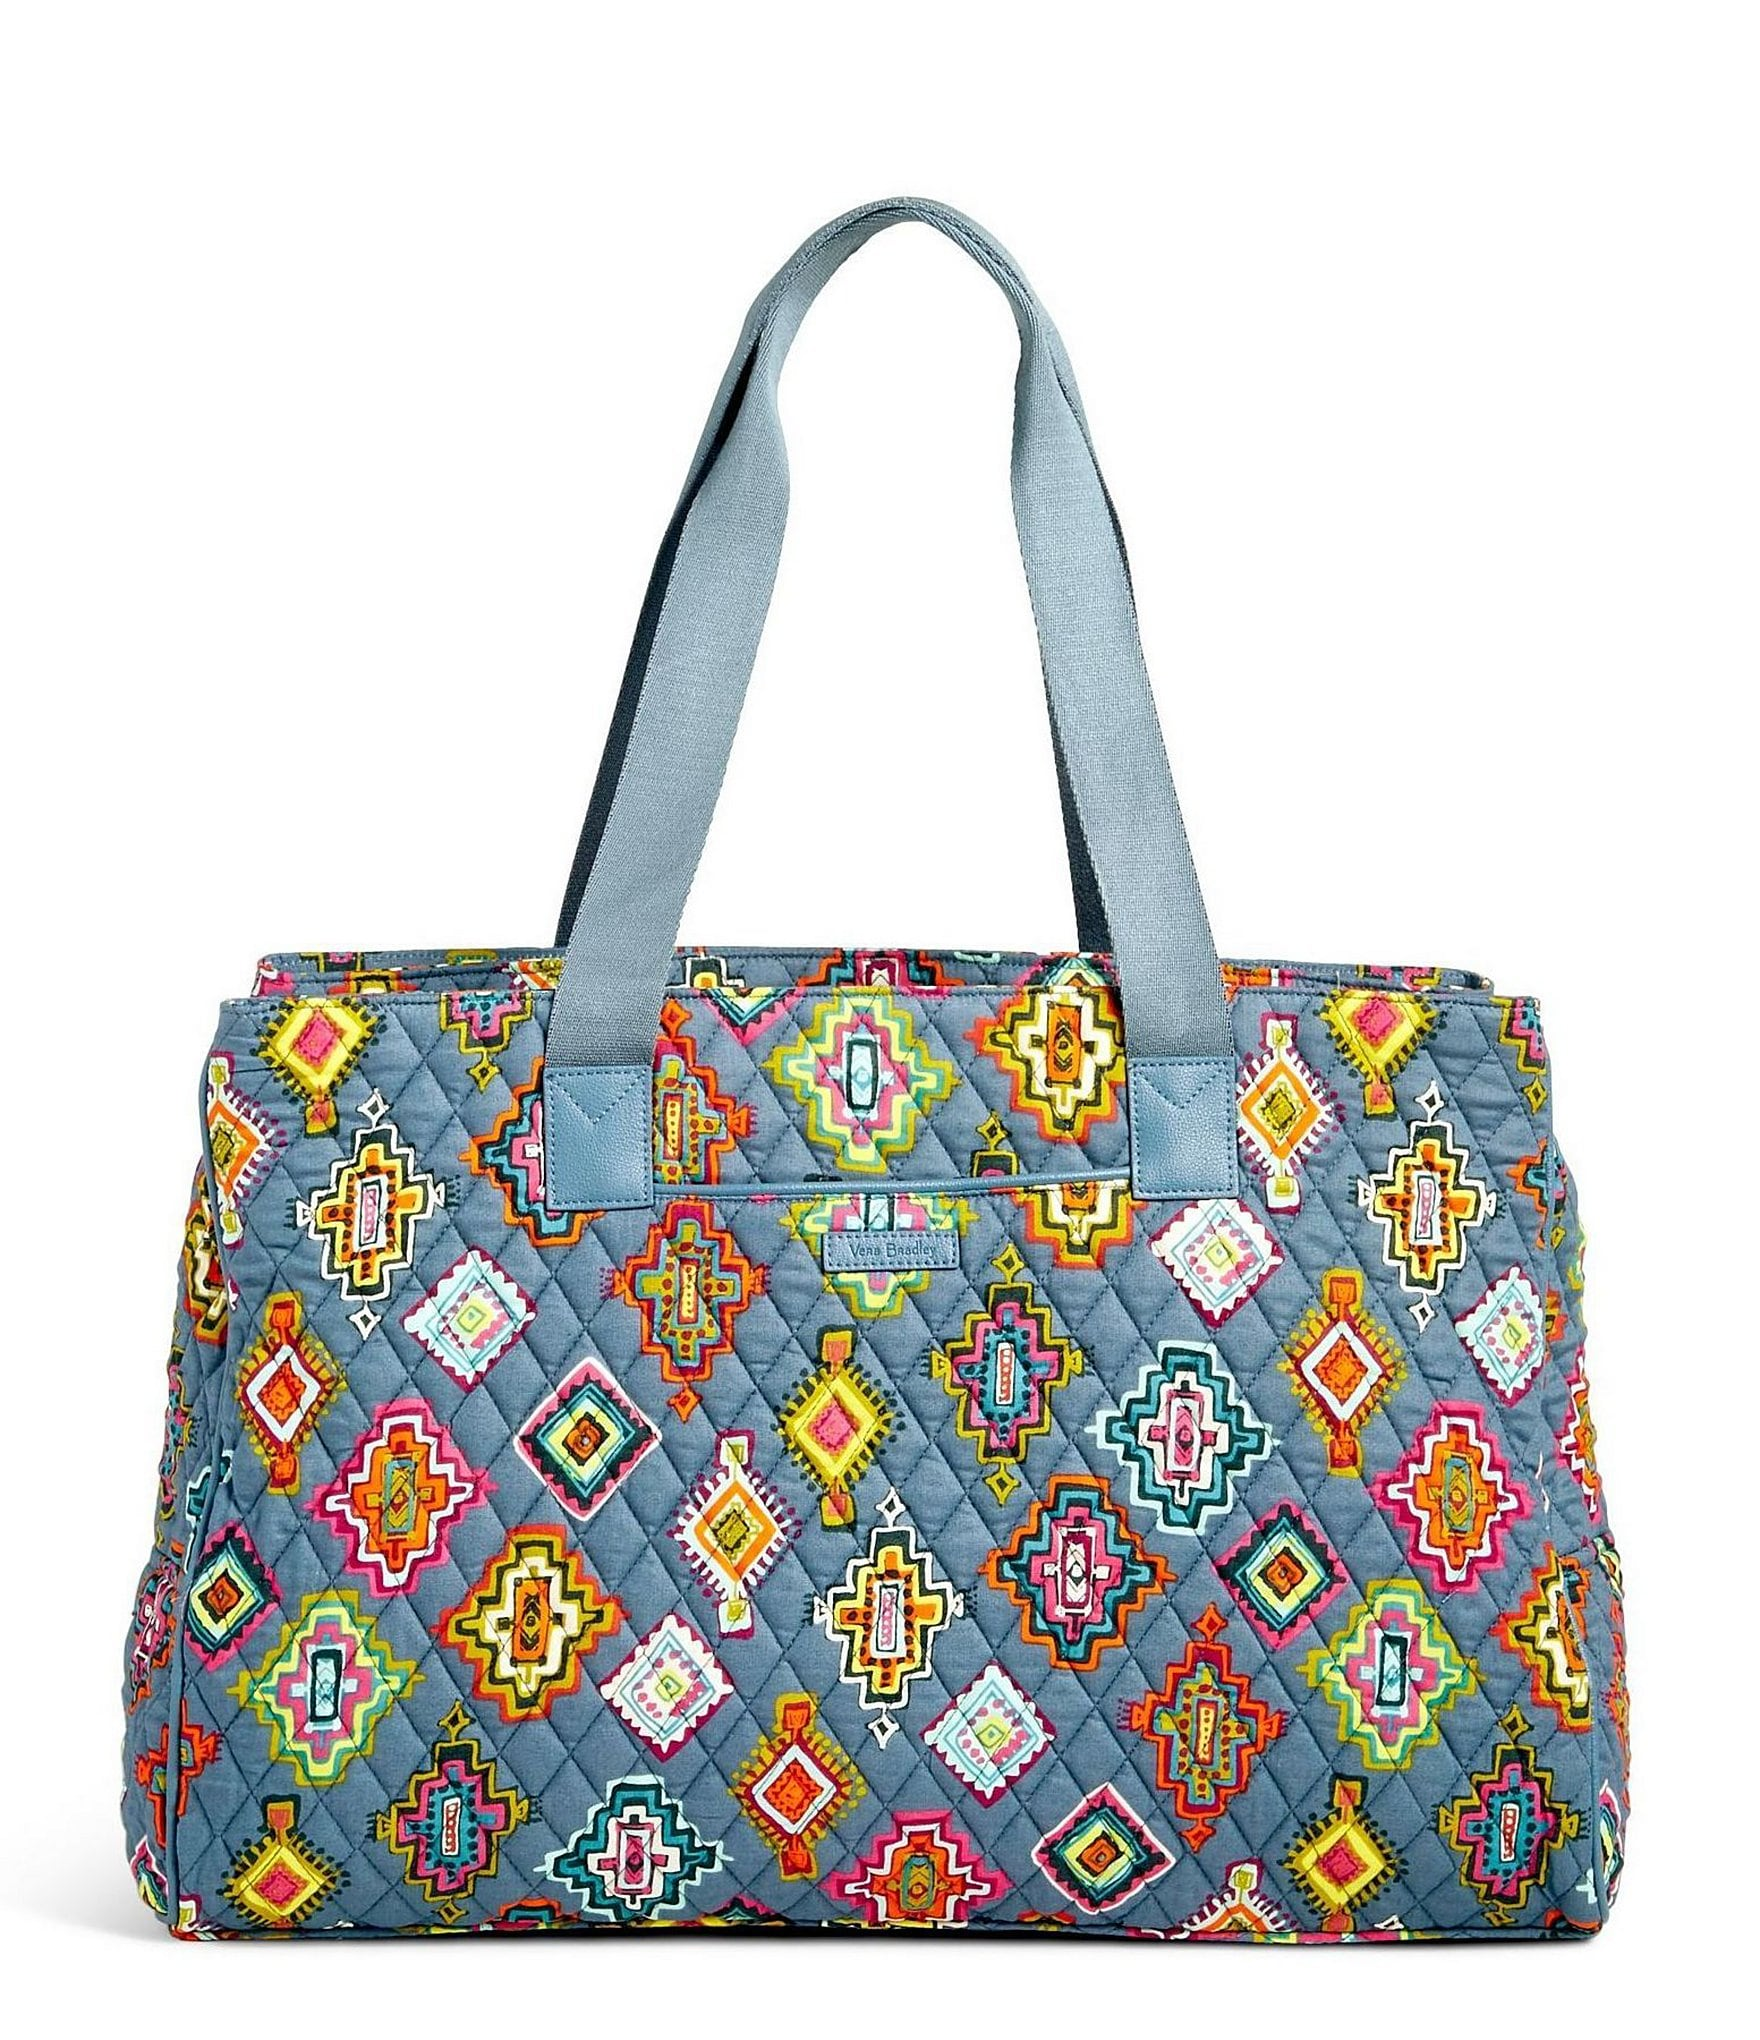 Vera Bradley Travel Bag Carry On